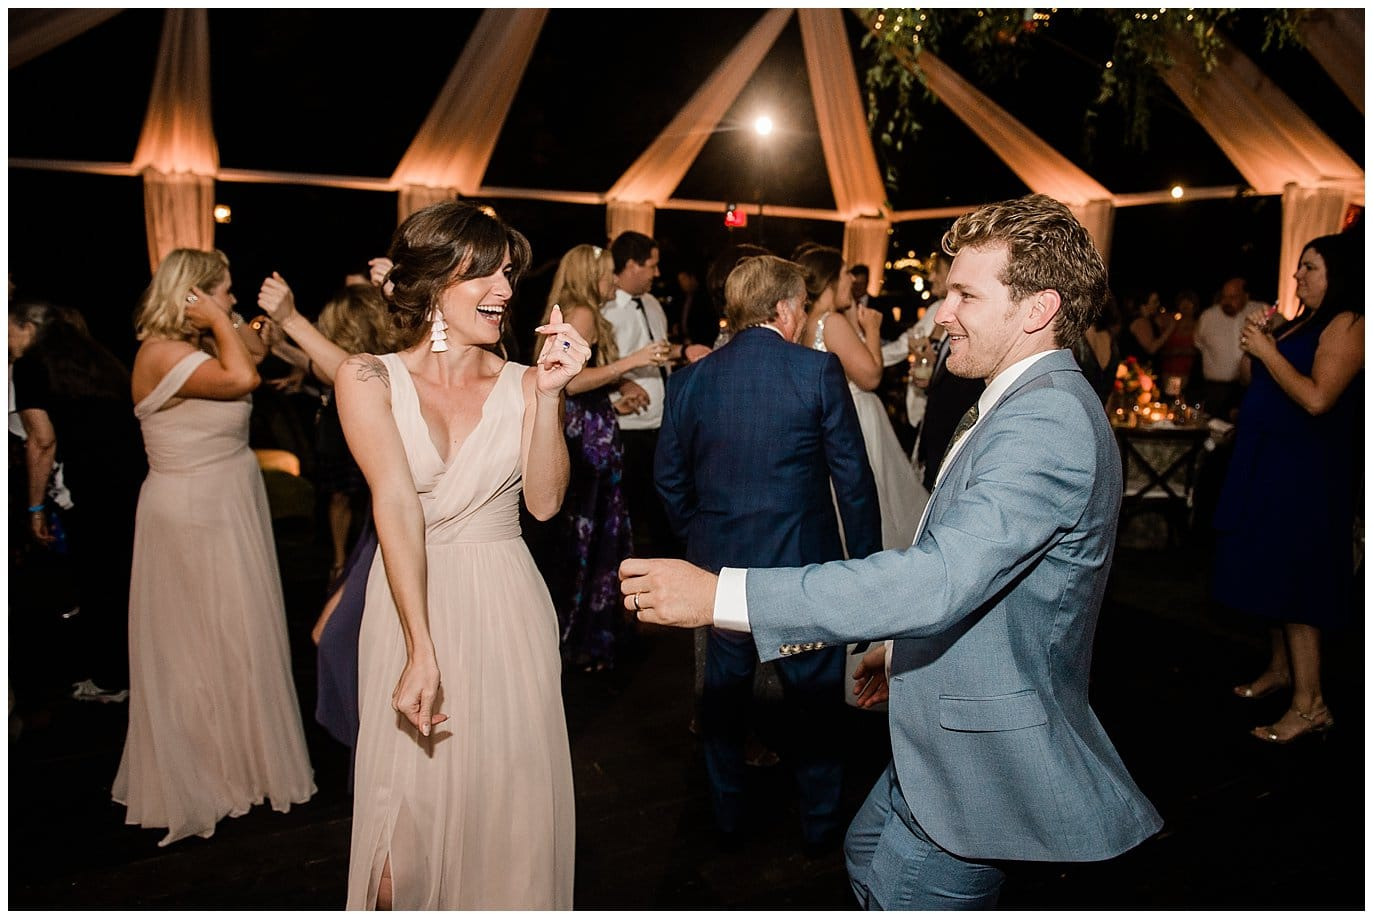 open air wedding reception dancing photo